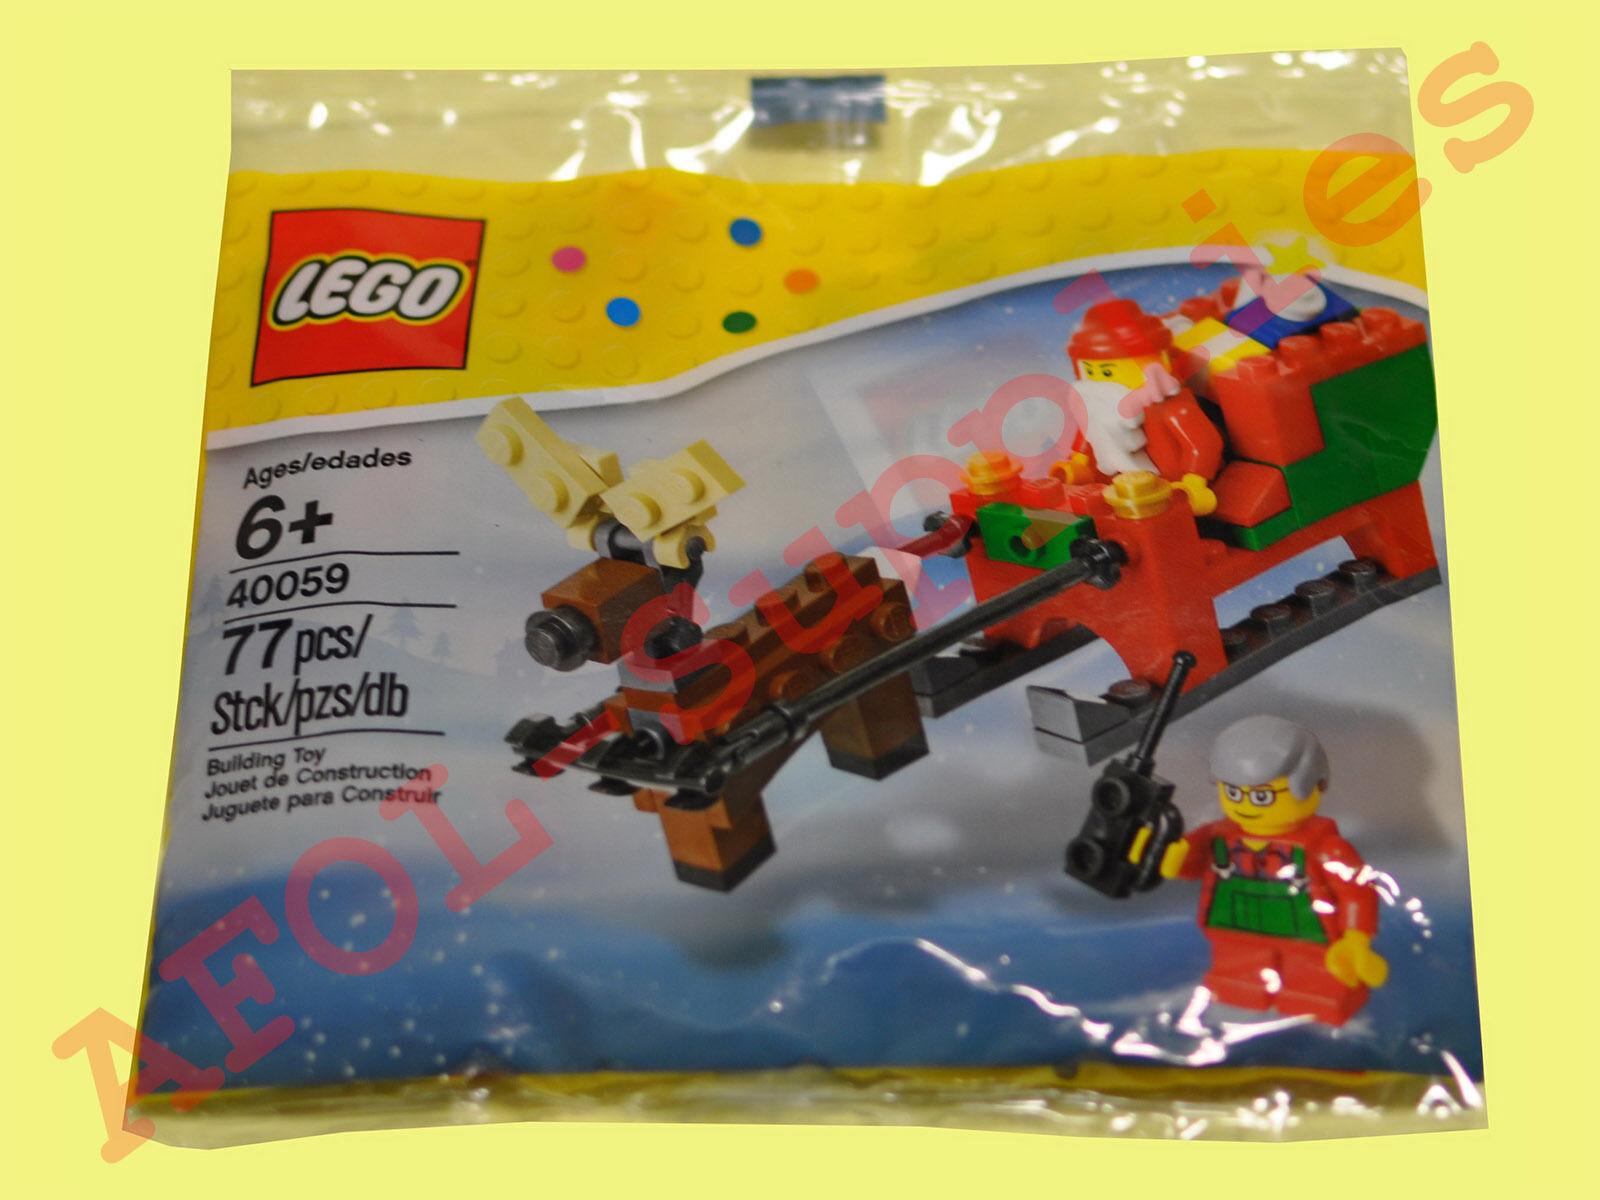 LEGO 40059 Christmas (Weihnachten) LEGO Santa Sleigh (Schlitten) Polybag